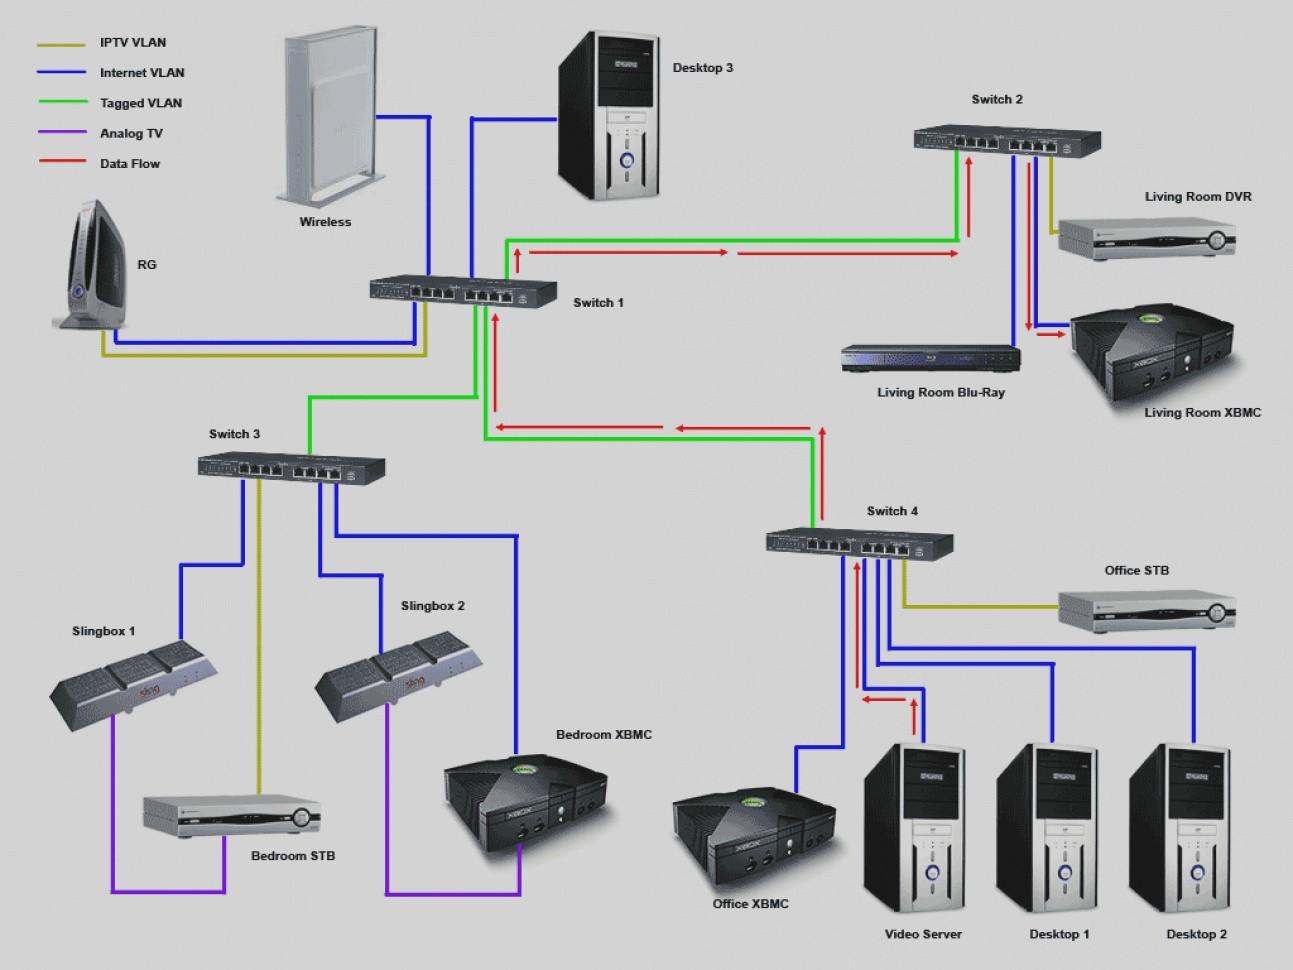 uverse outside wiring diagram fender jaguar bass tv library